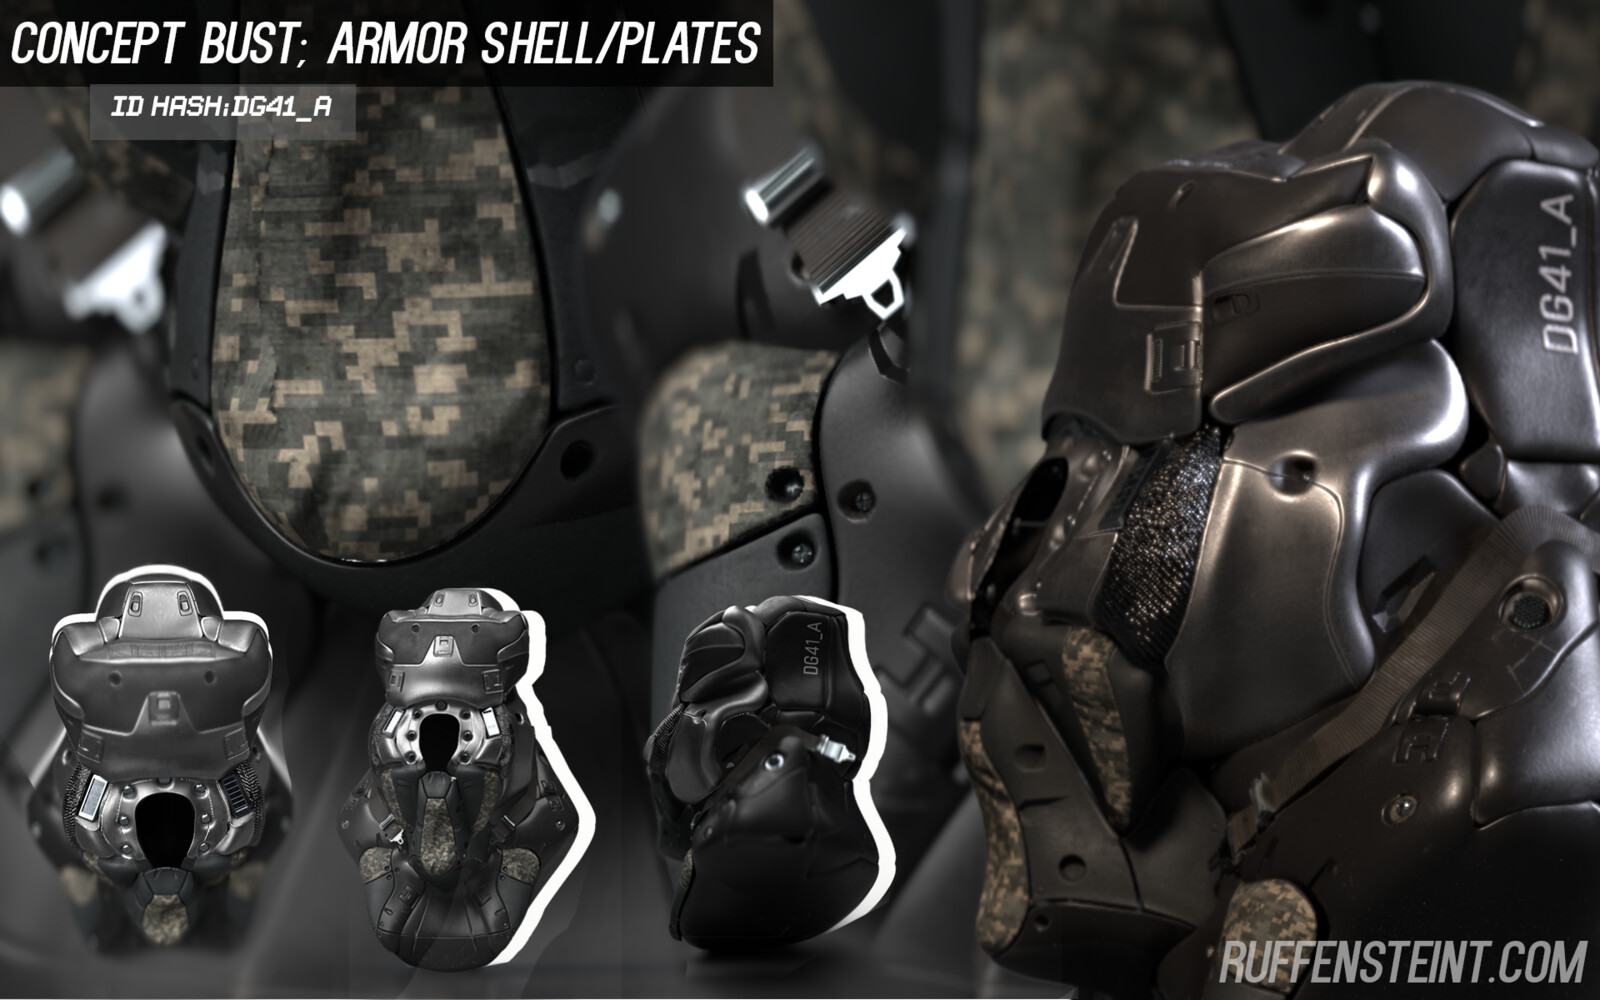 DG41_A - Concept Armor Bust; Shelling/Plates